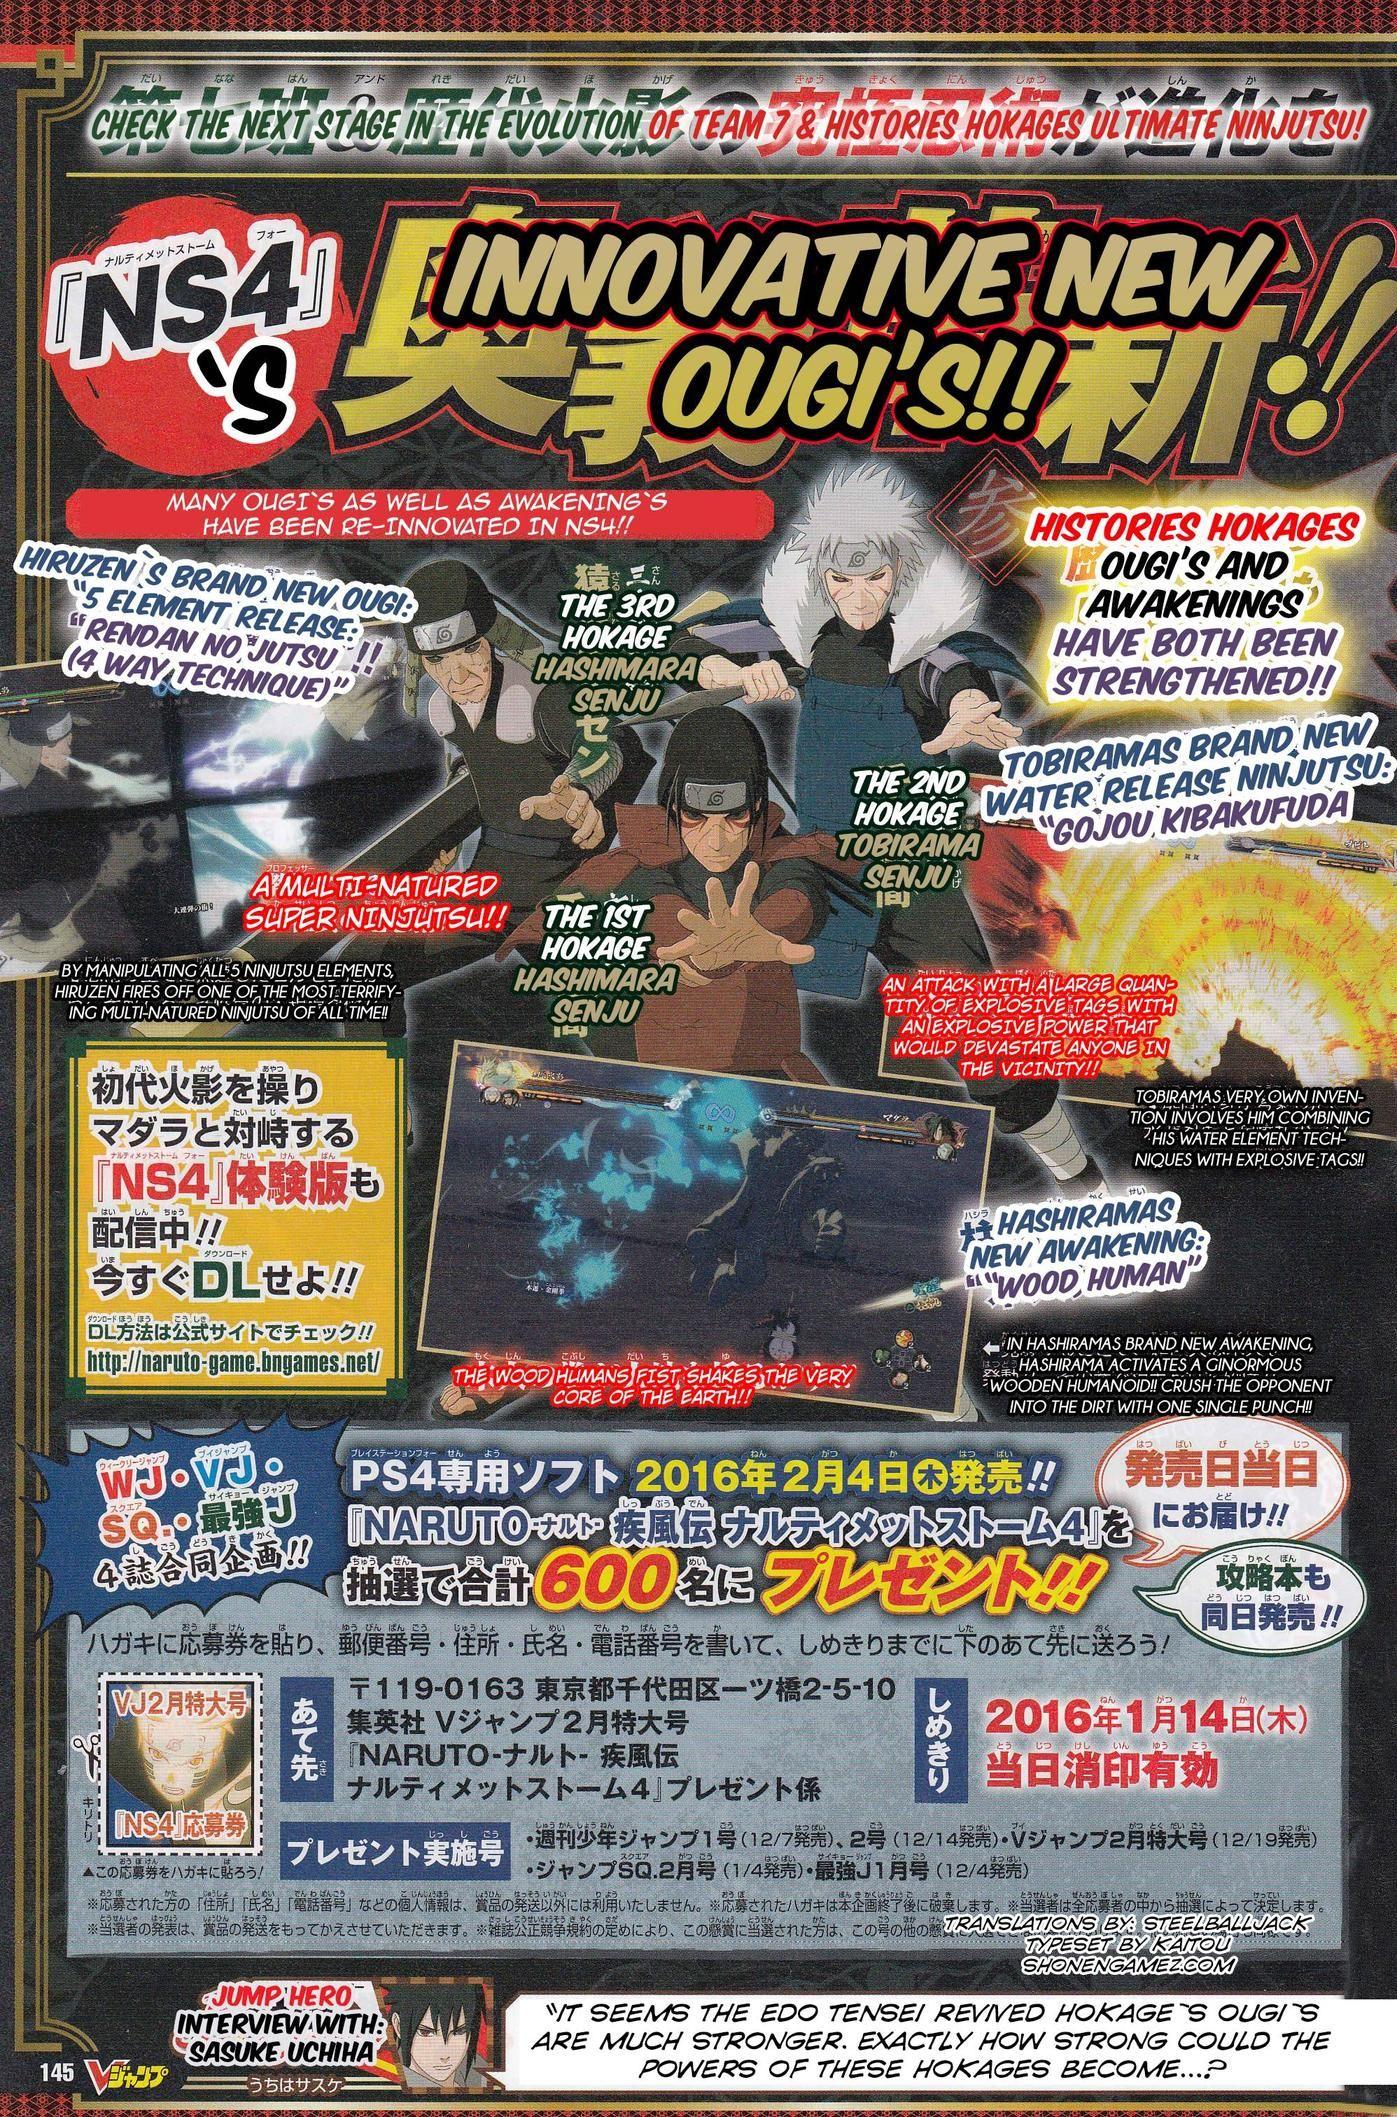 naruto-shippuden-ultimate-ninja-storm-4-jutsu-combinati-02